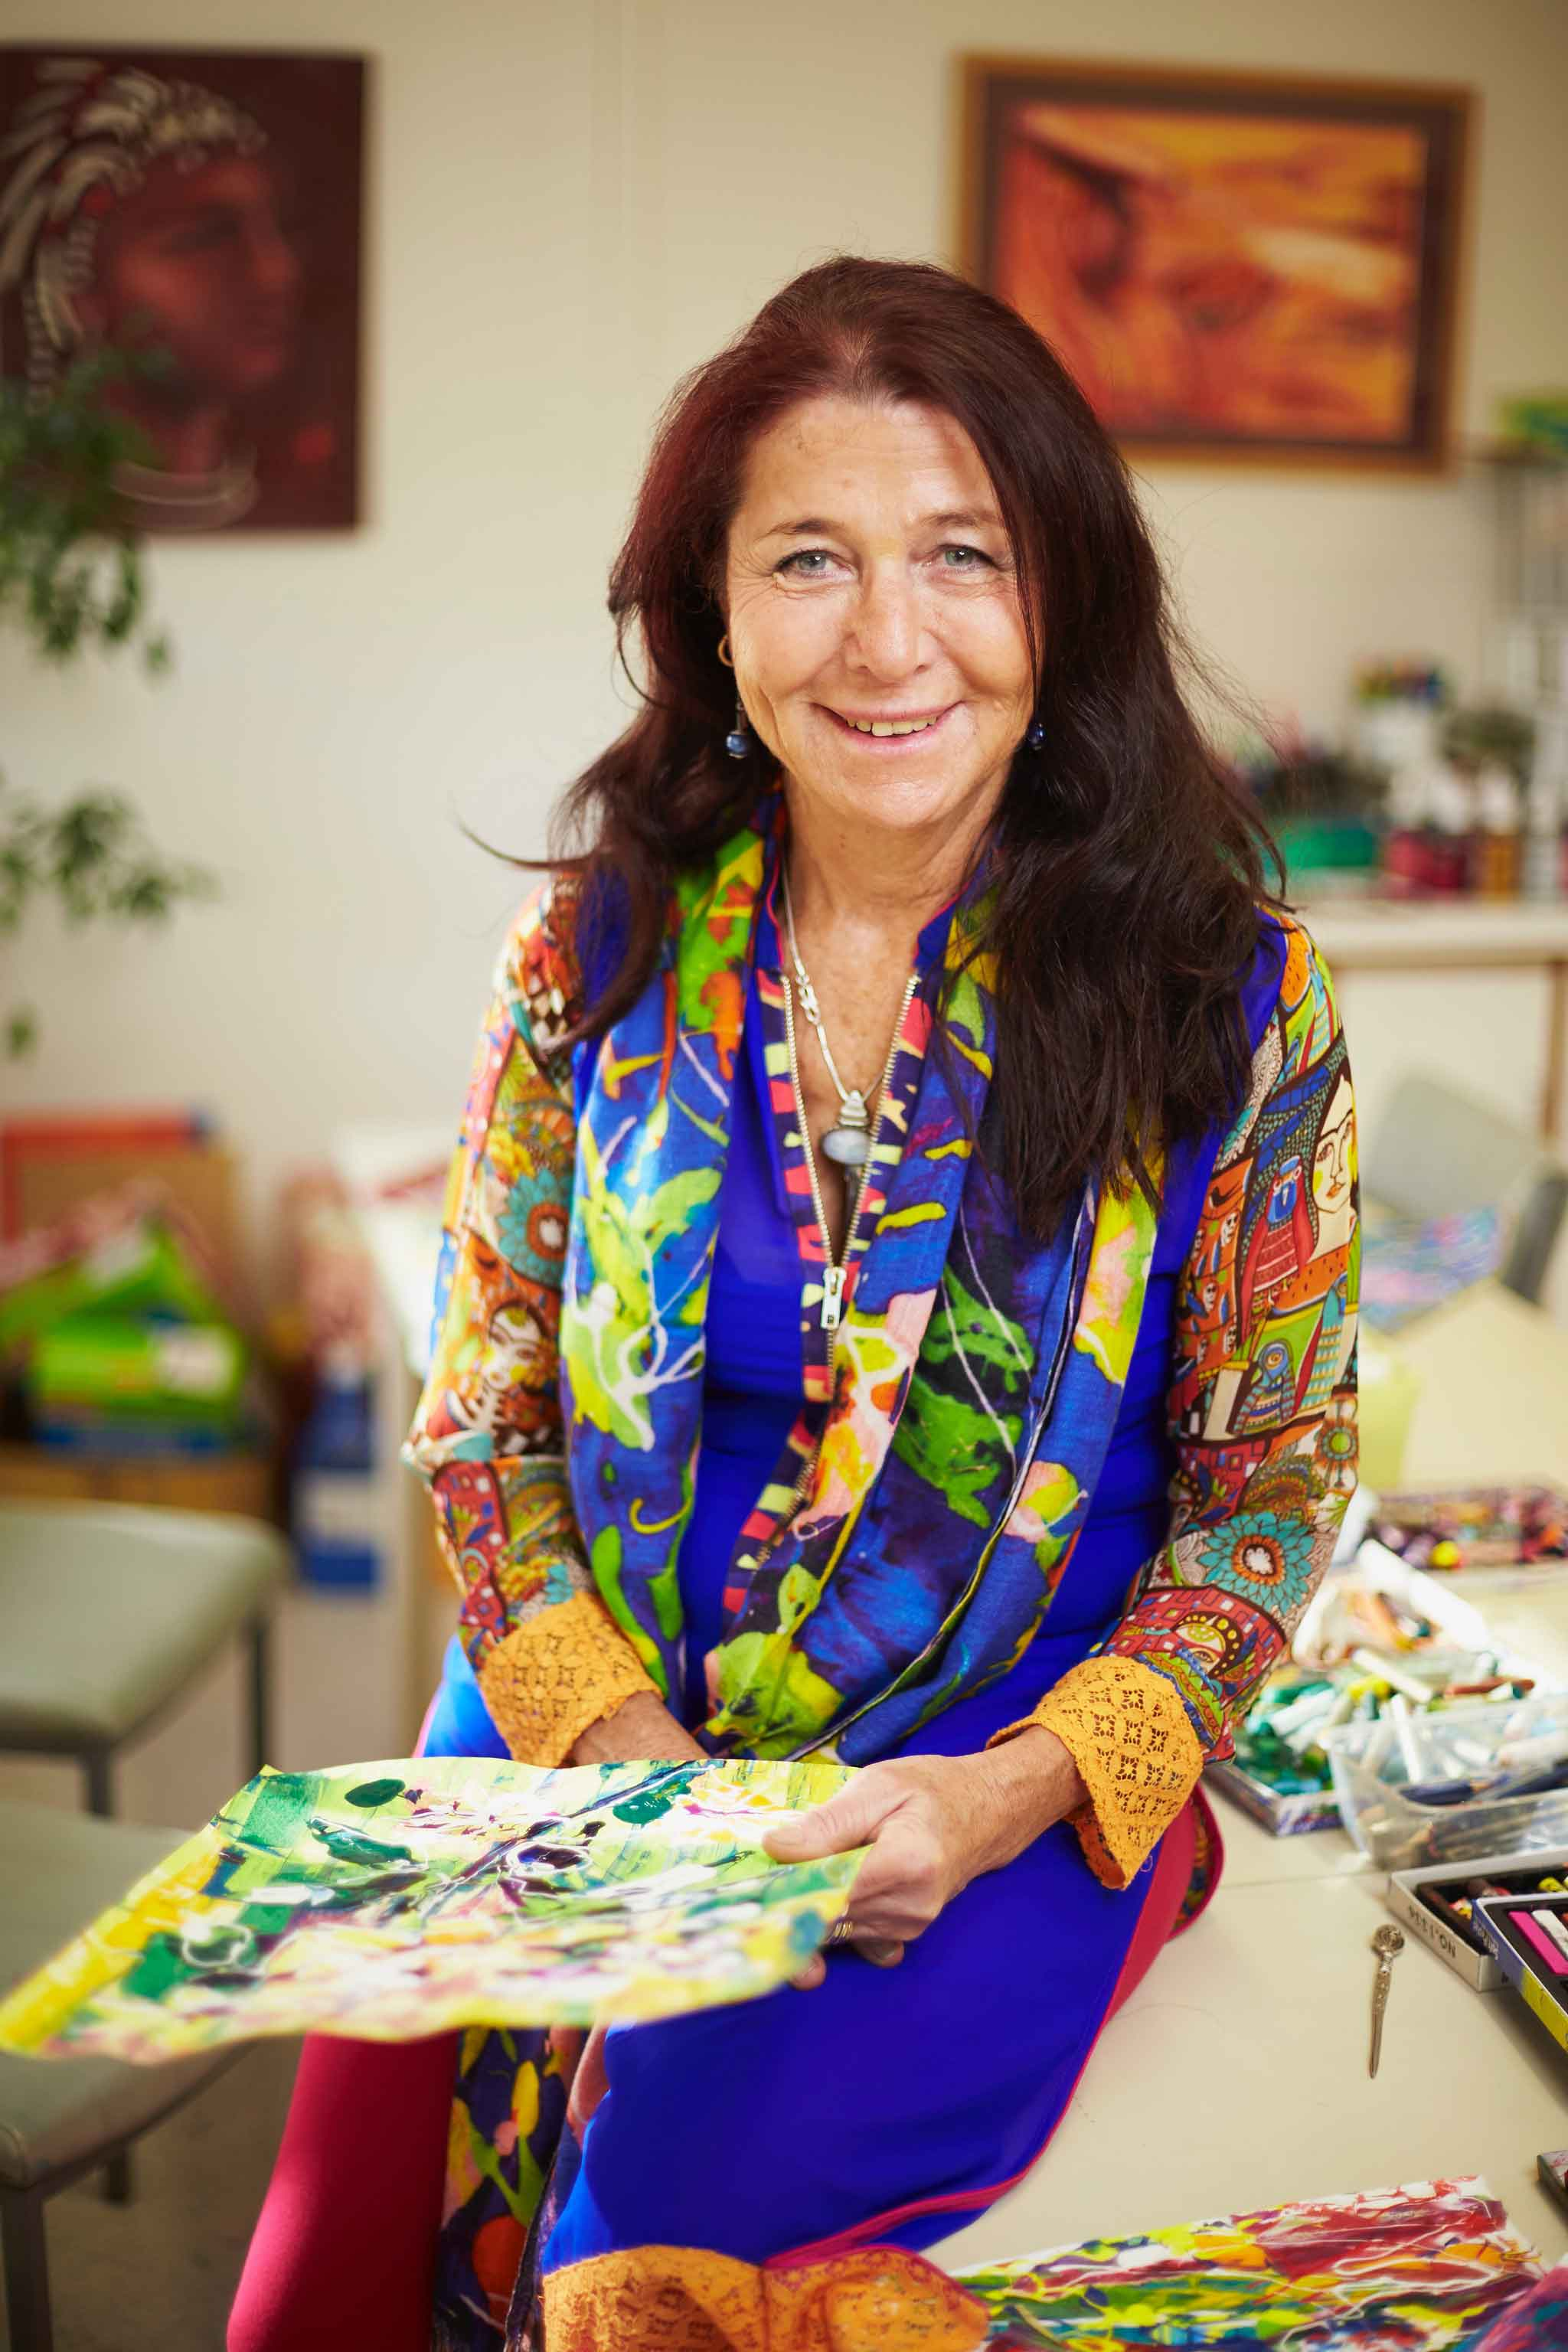 Dena Lawrence, Owner of Firesun   Image courtesy of Firesun